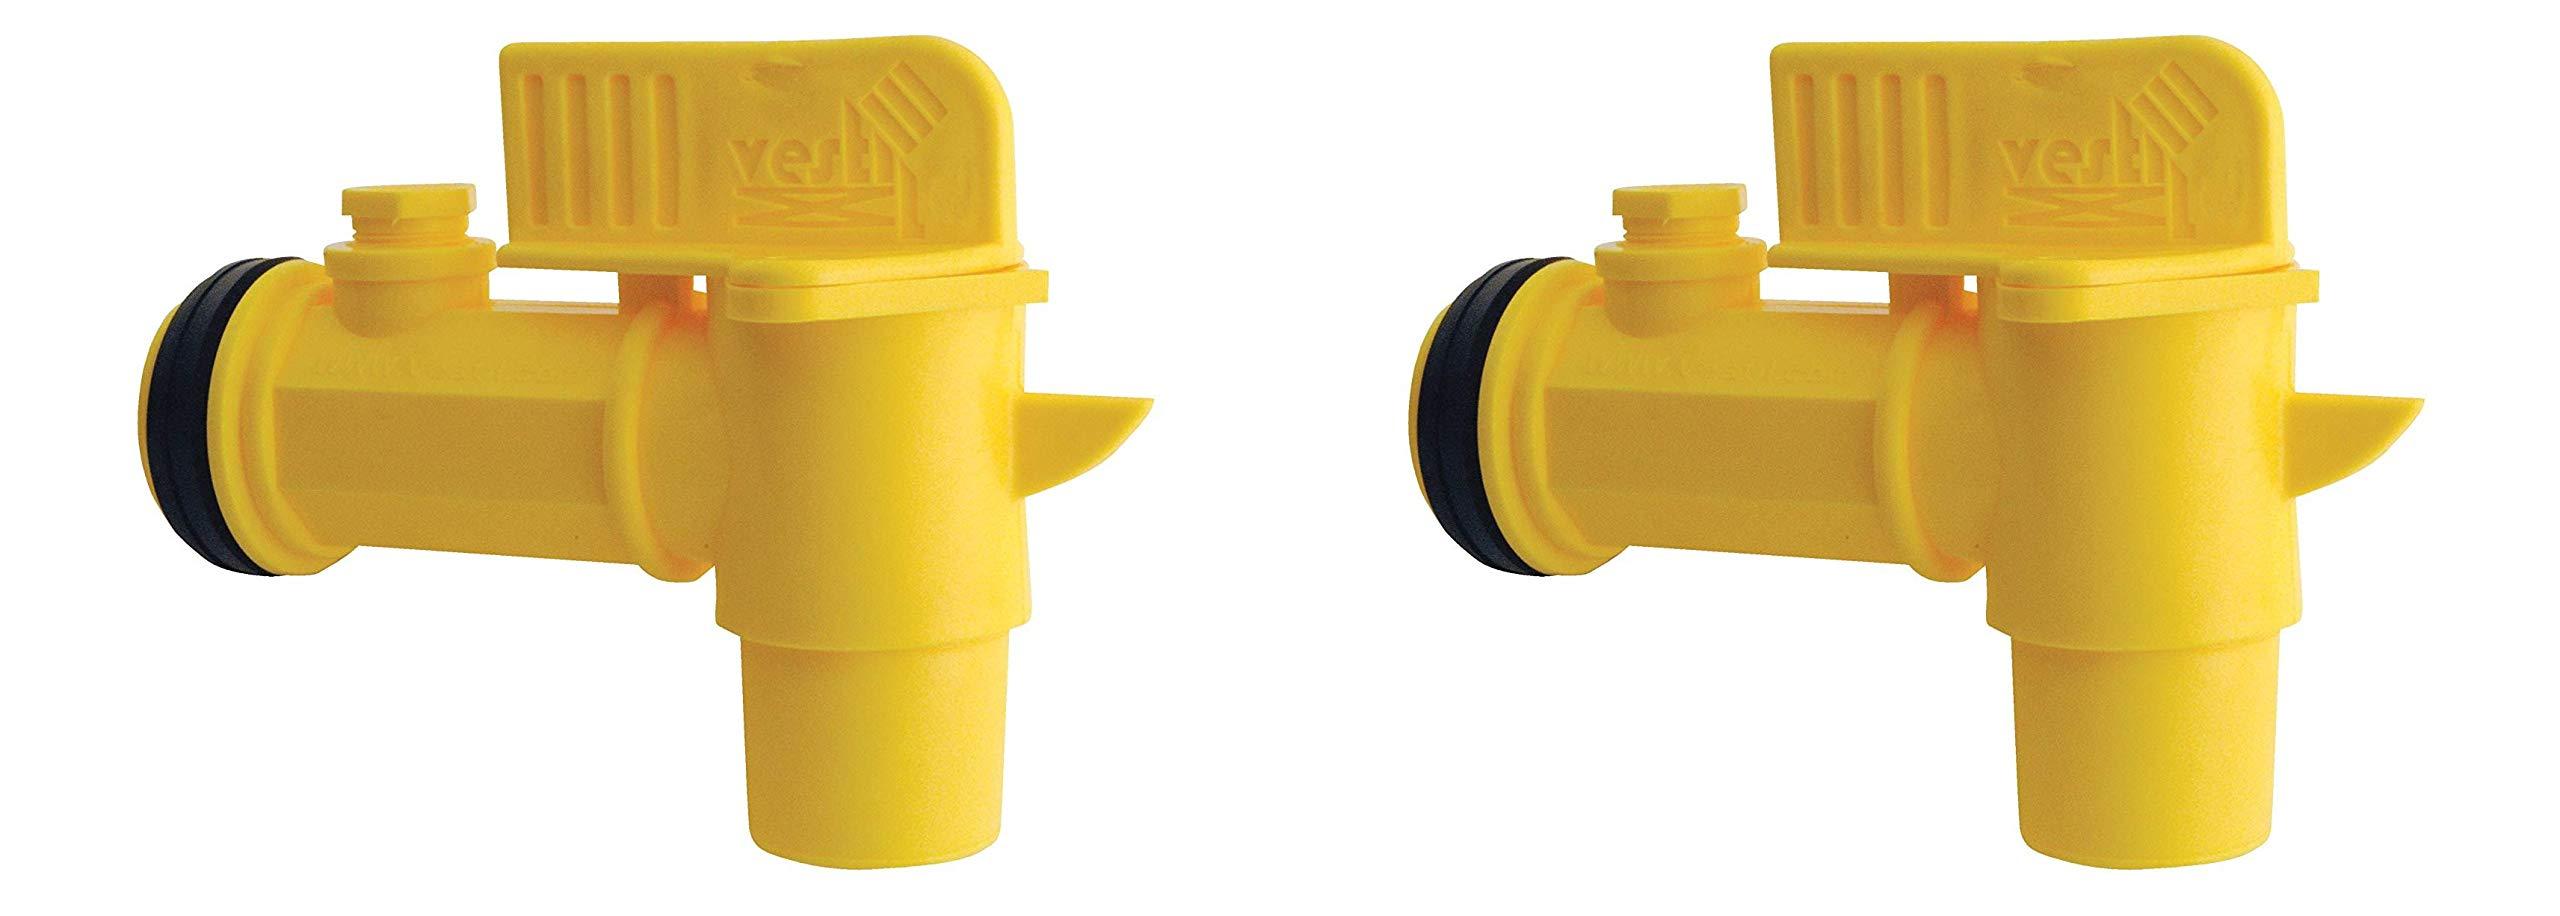 Vestil JDFT Plastic Manual Handle Jumbo Drum Faucet, Fits 2'' Drum Openings (Тwo Рack, Yellow)